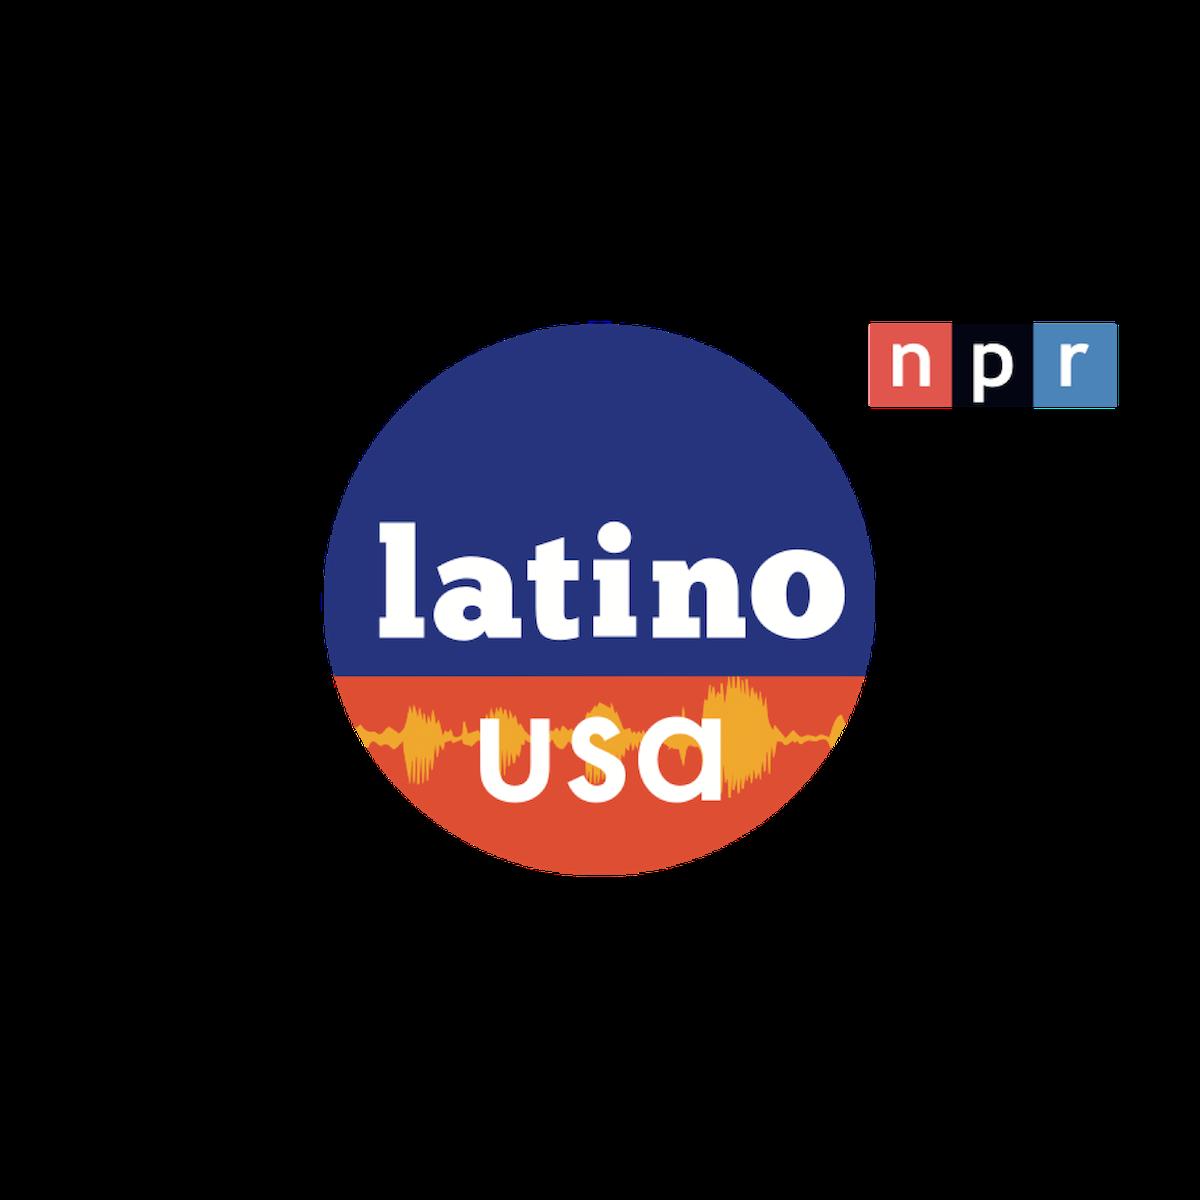 The Green Team for NPR's Latino USA -